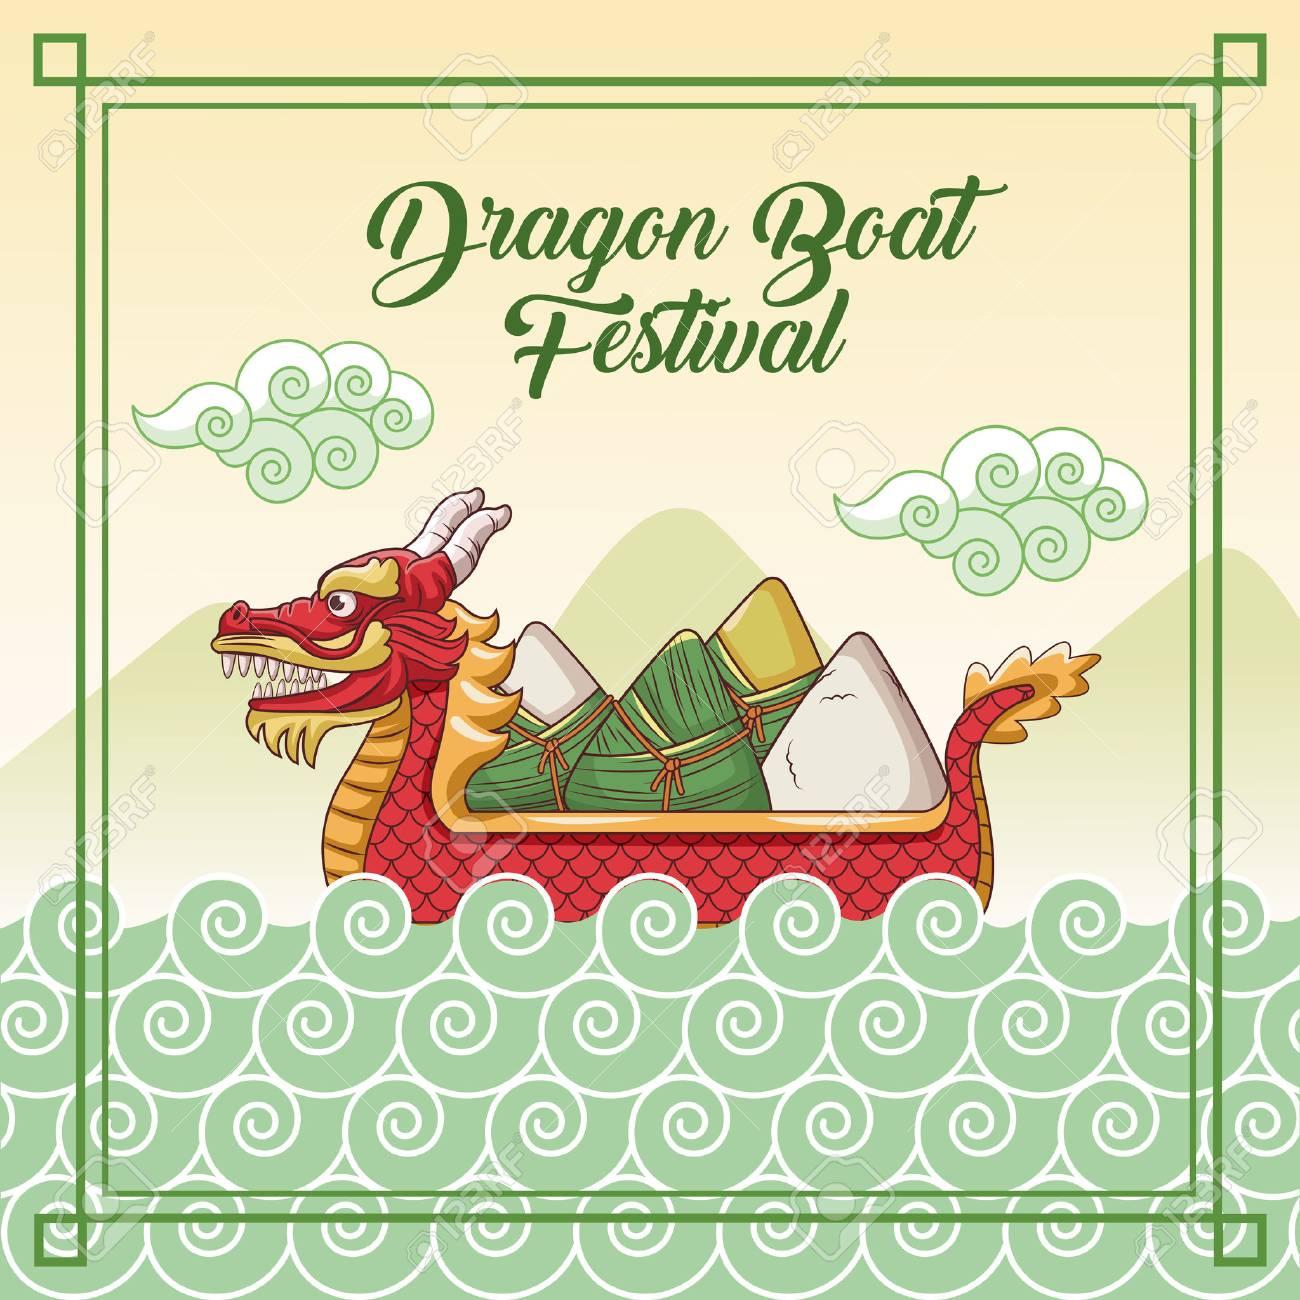 Dragon boat festival cartoon icon vector illustration graphic - 95305590